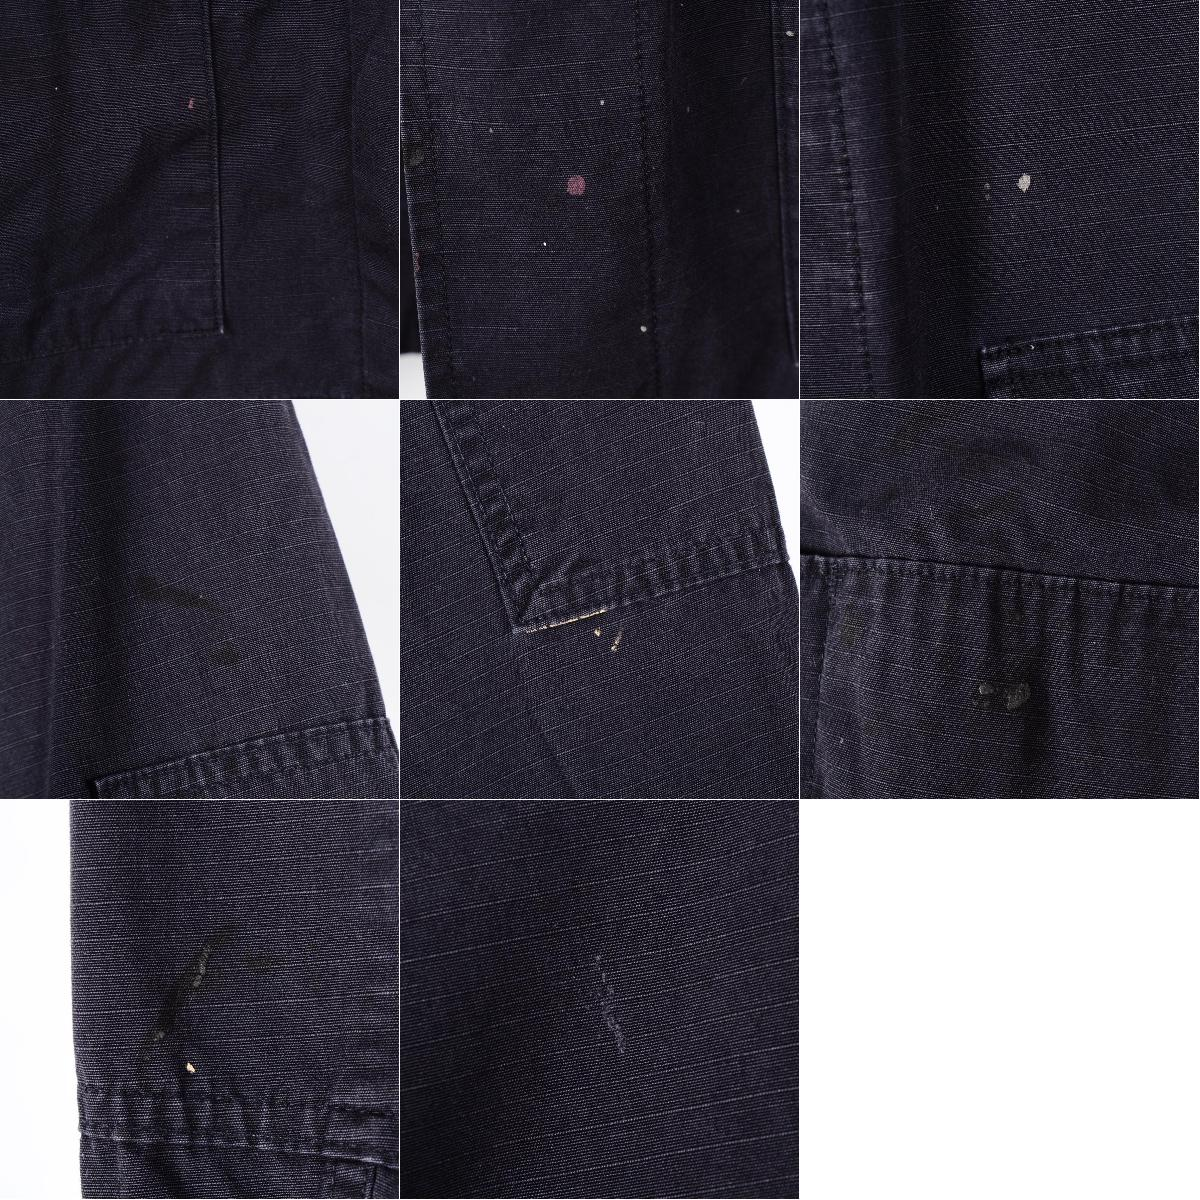 97年交货美军实际上的物品深蓝彩色COAT HOT WEATHER BLACK 357 B.D.U军事衬衫MEDIUM-LONG人L UNICOR GREENVILLE IL/wen6136 160306